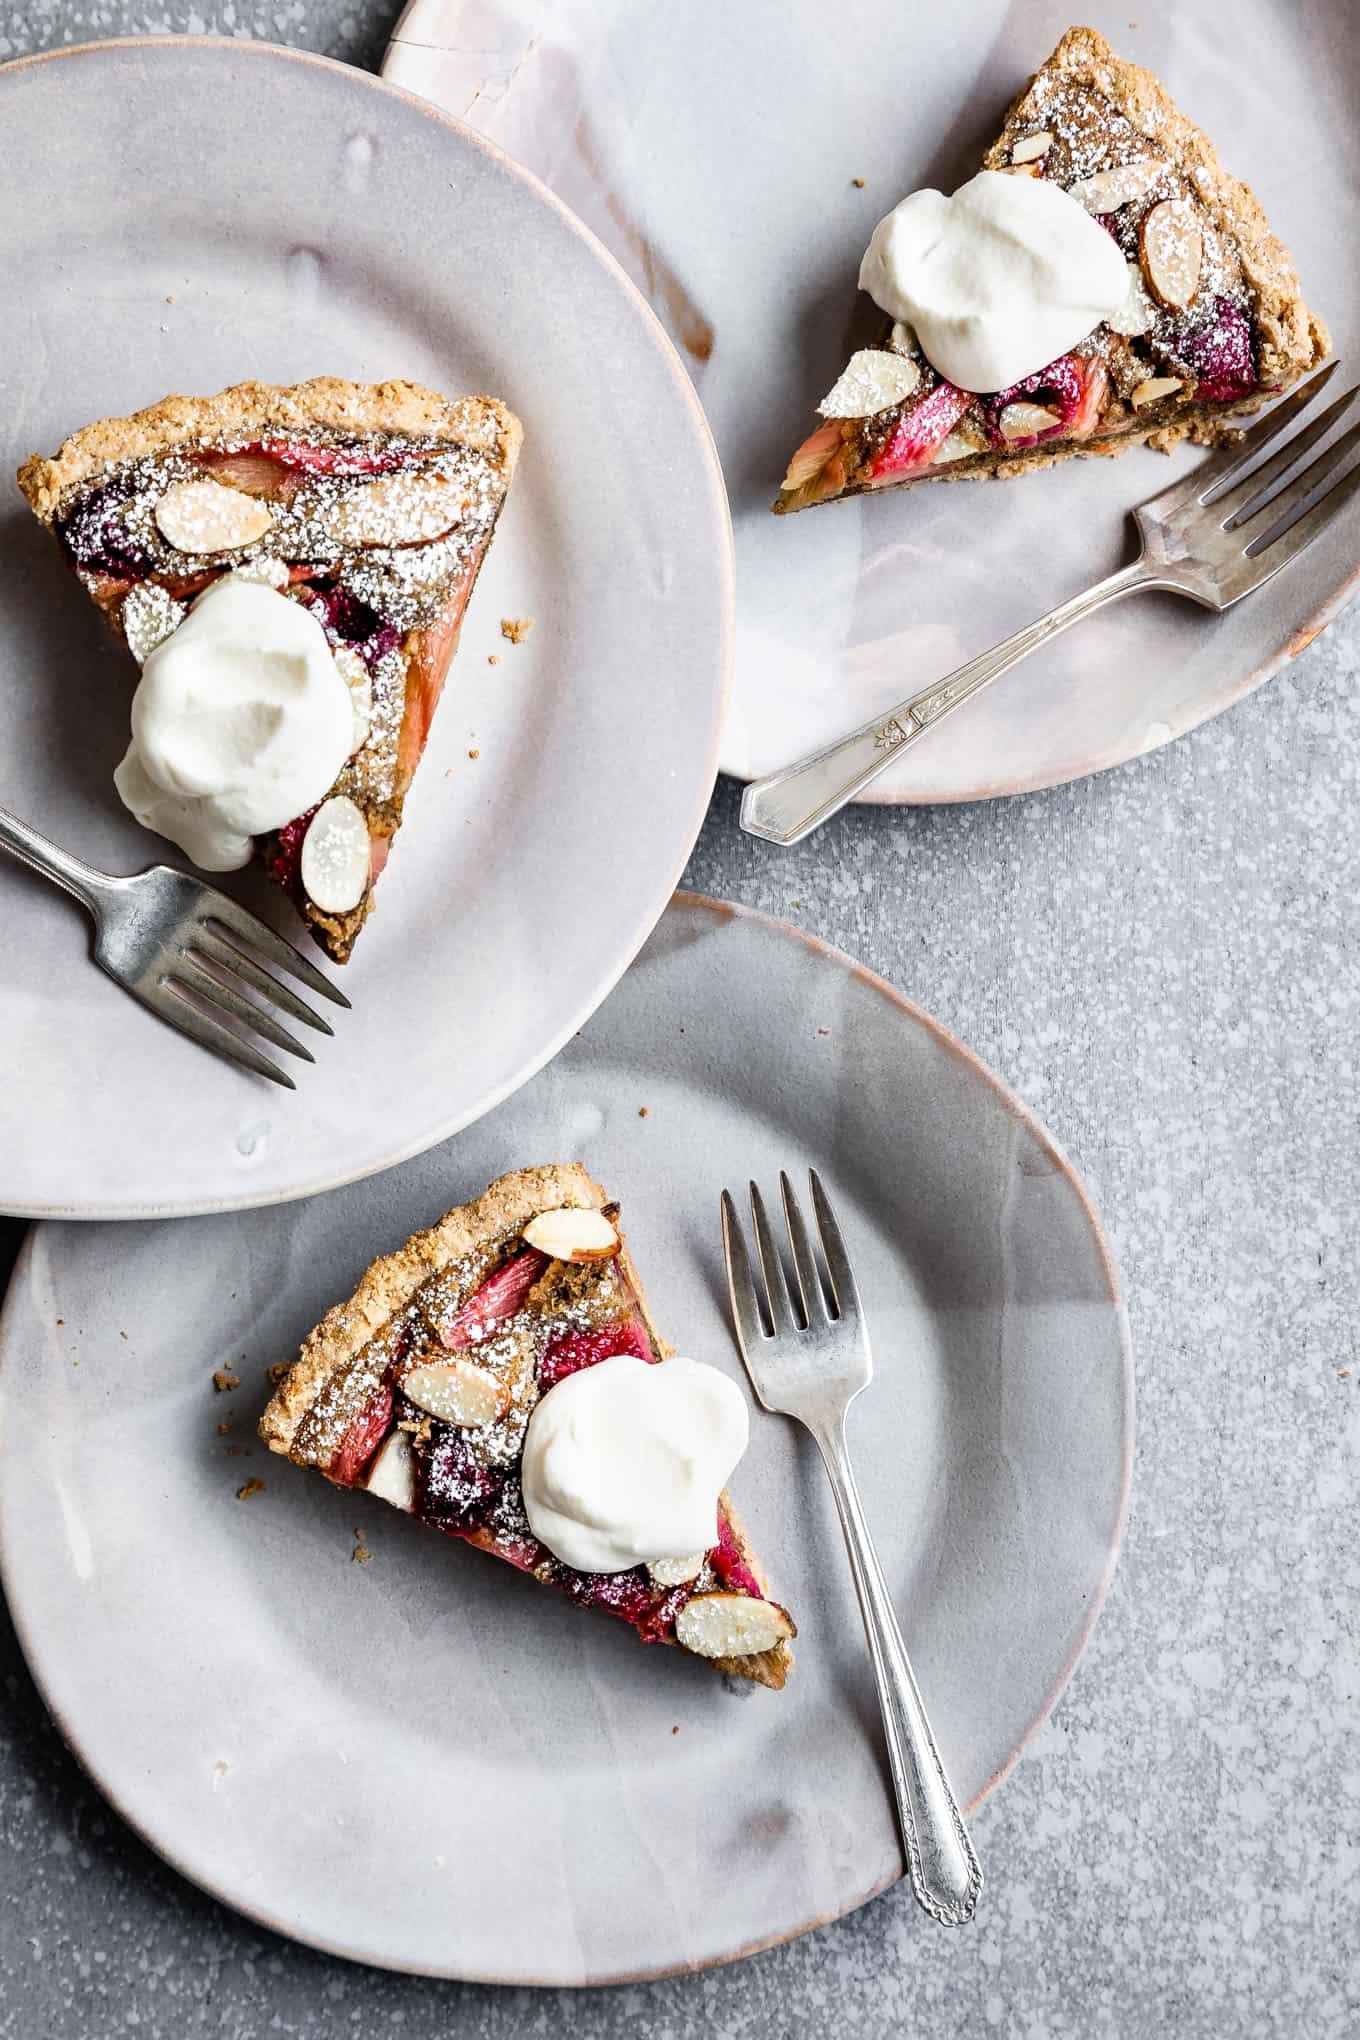 Gluten-Free Raspberry Rhubarb Almond Tart with Chai Spices